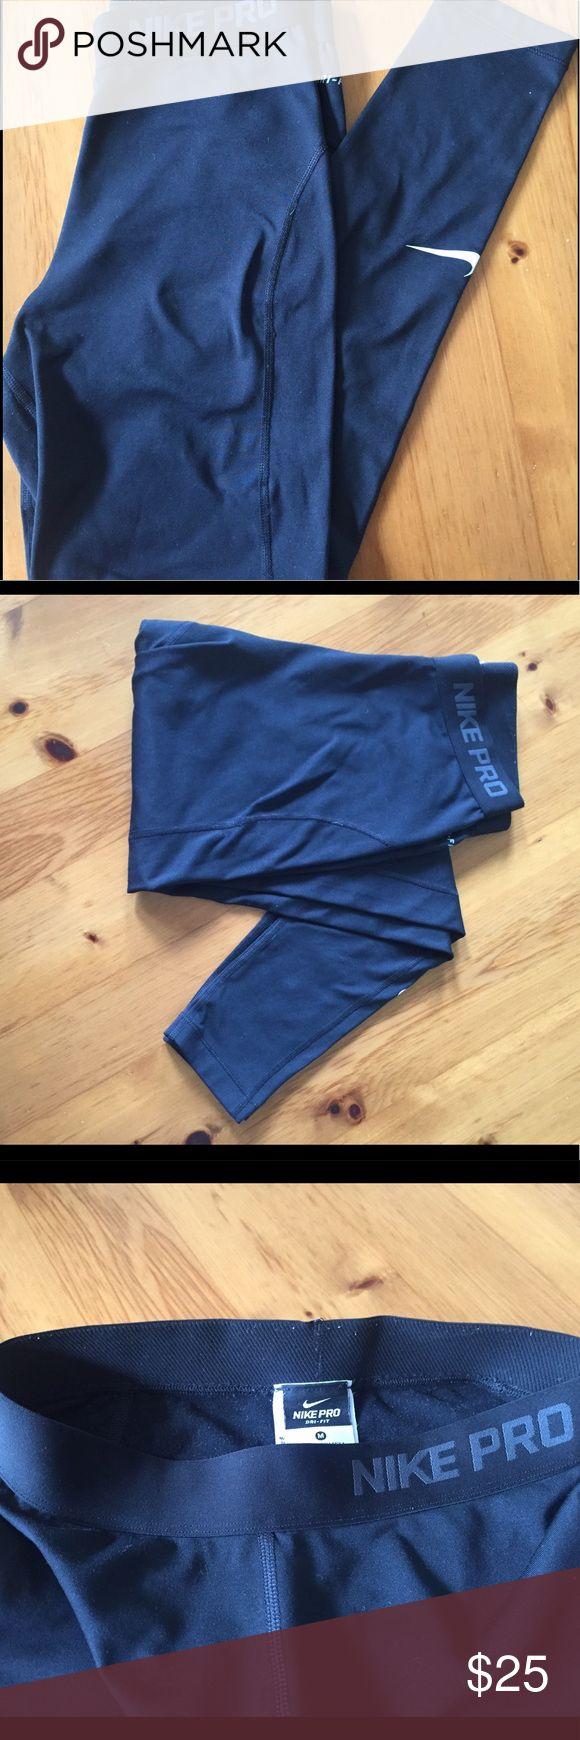 Nine Pro Leggins Nike Pro Leggins; full length pants, tight fitted, no marks or signs of wear Nike Pants Leggings